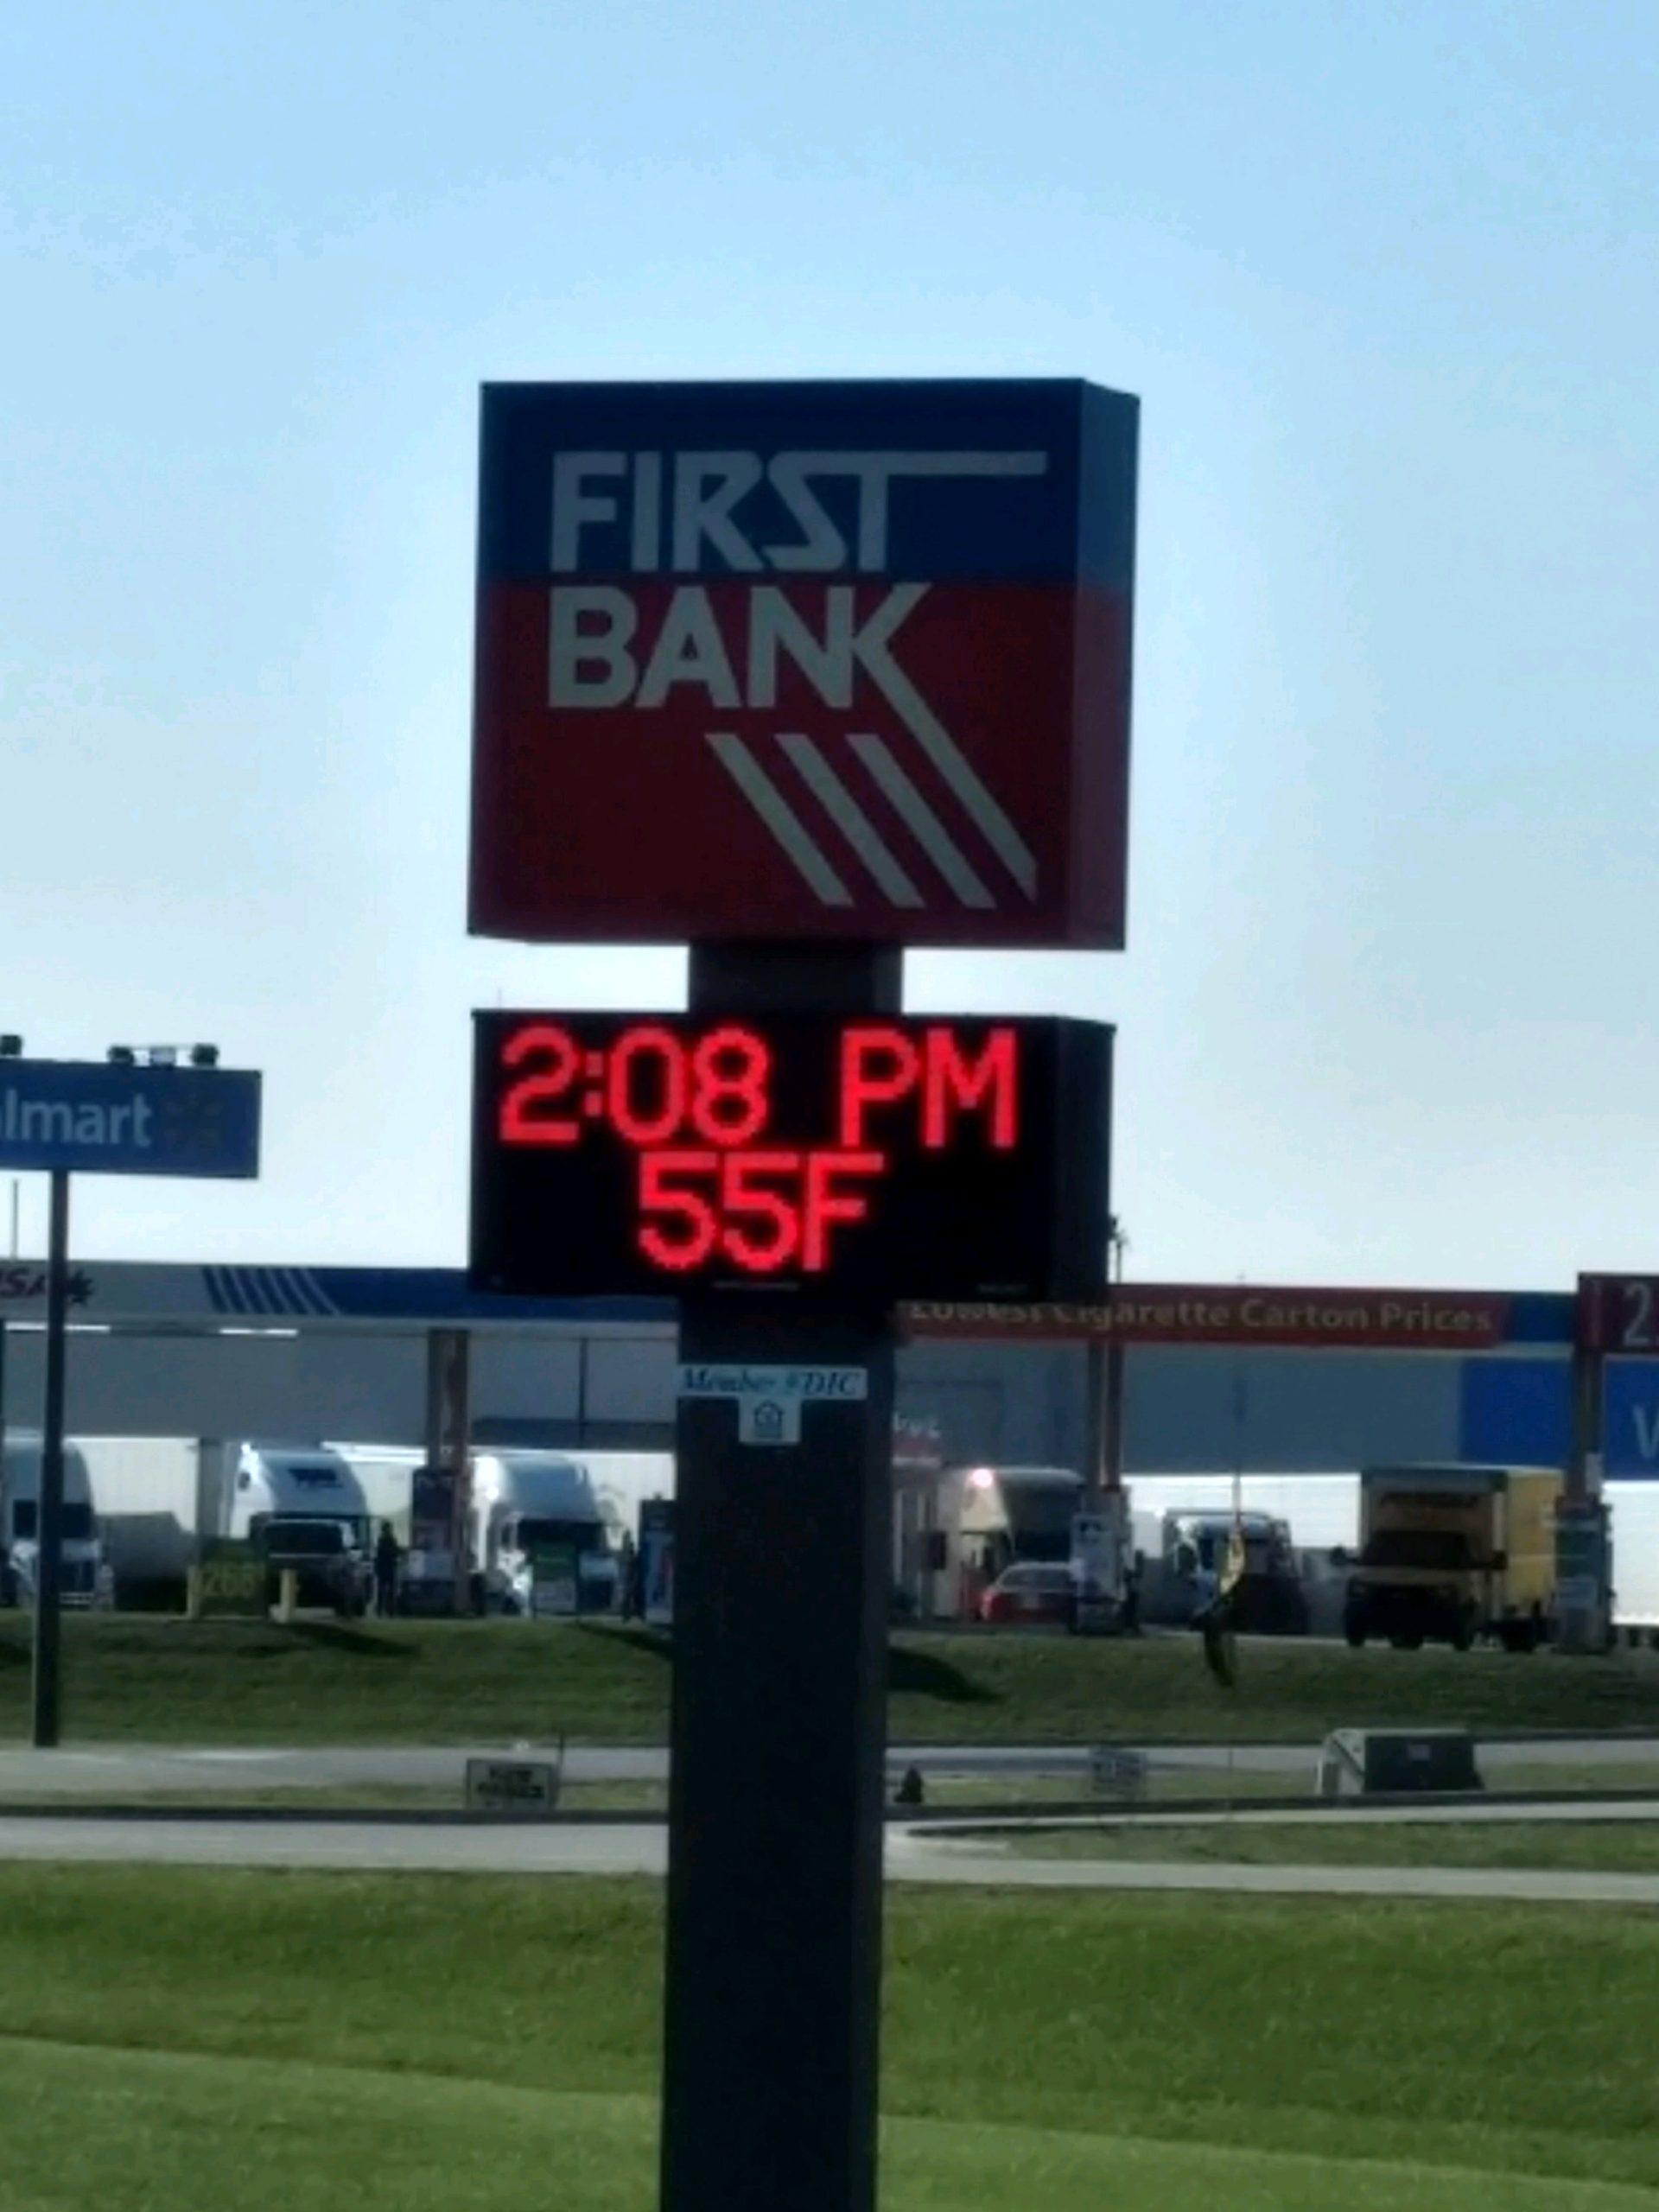 First Bank in Vandalia has been sold